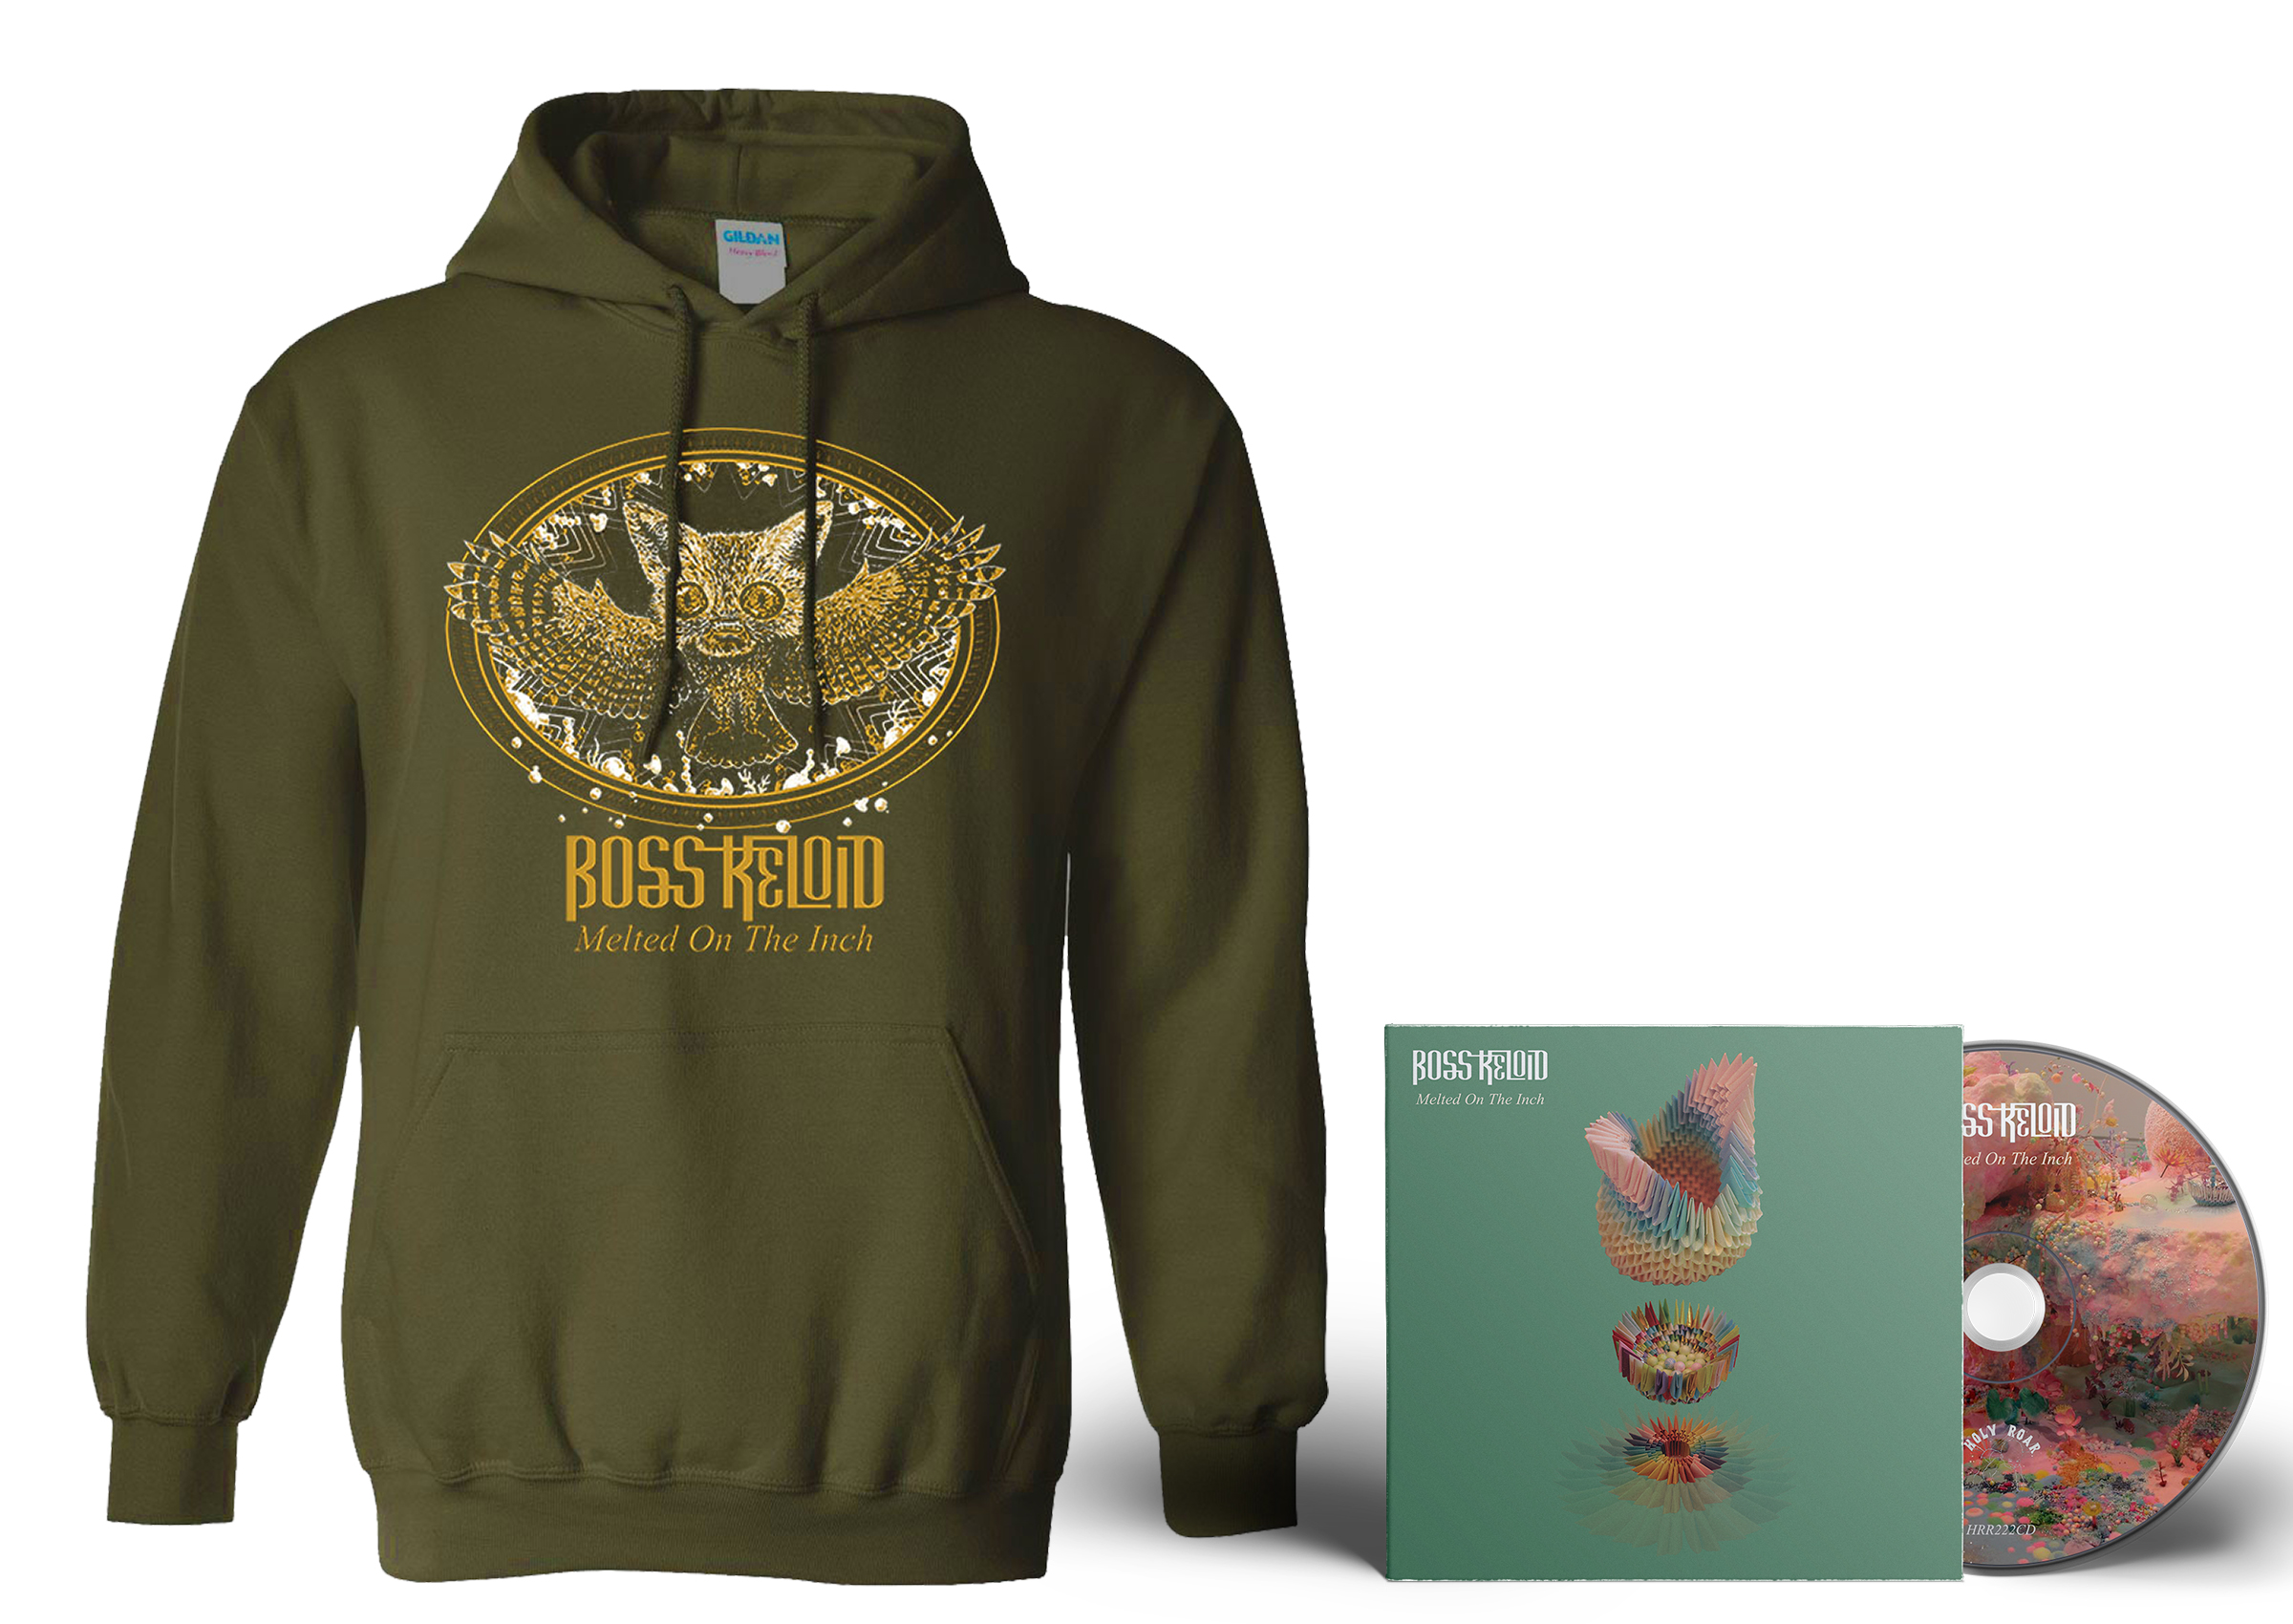 Boss Keloid 'Melted...' Foxowl hoodie + CD